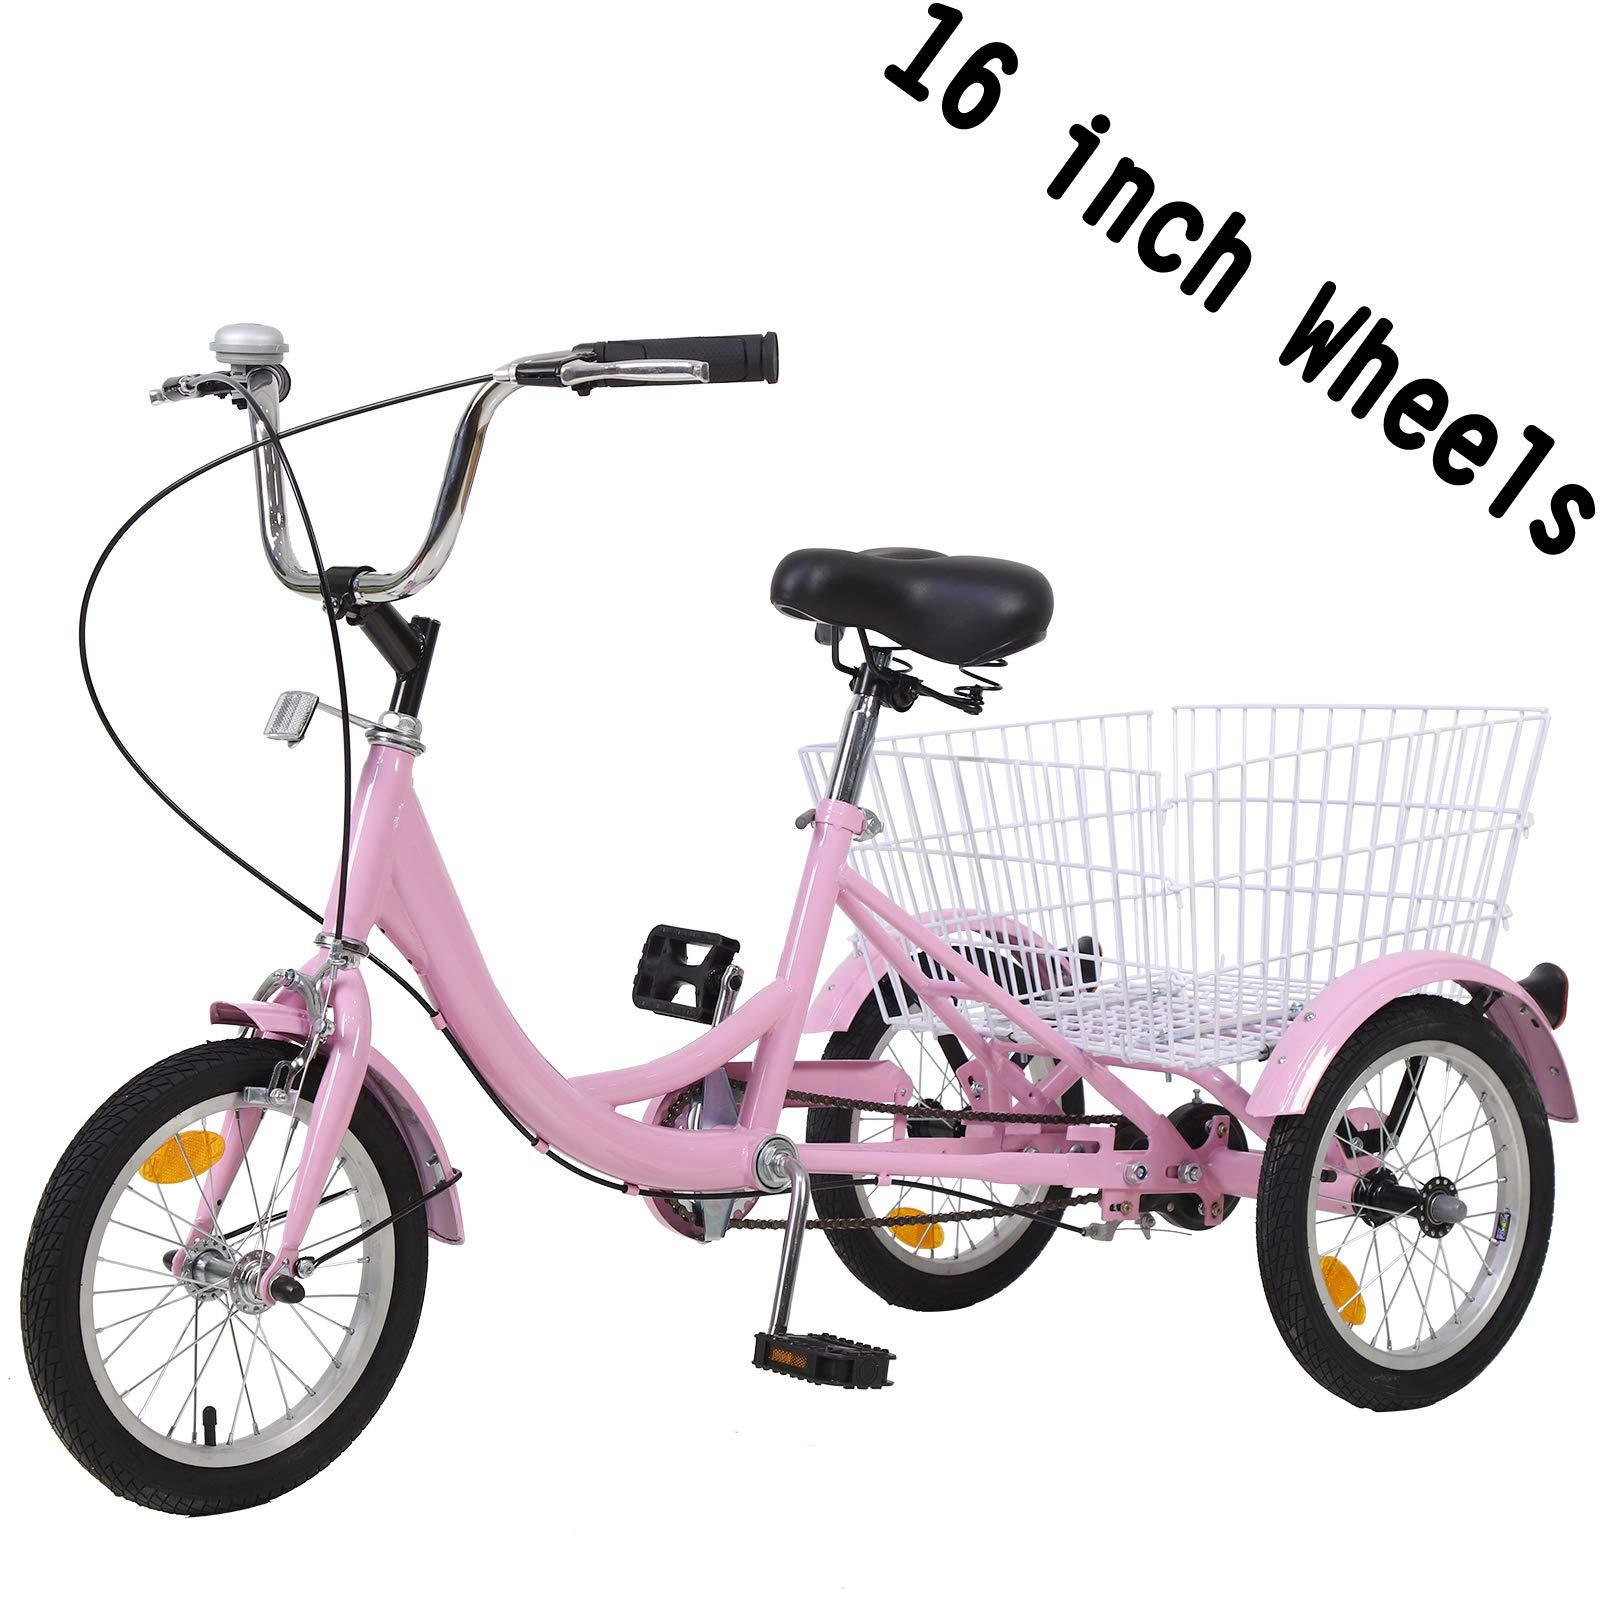 H&ZT Triciclo de 1 velocidad para adultos Trike Cruiser bicicleta ...